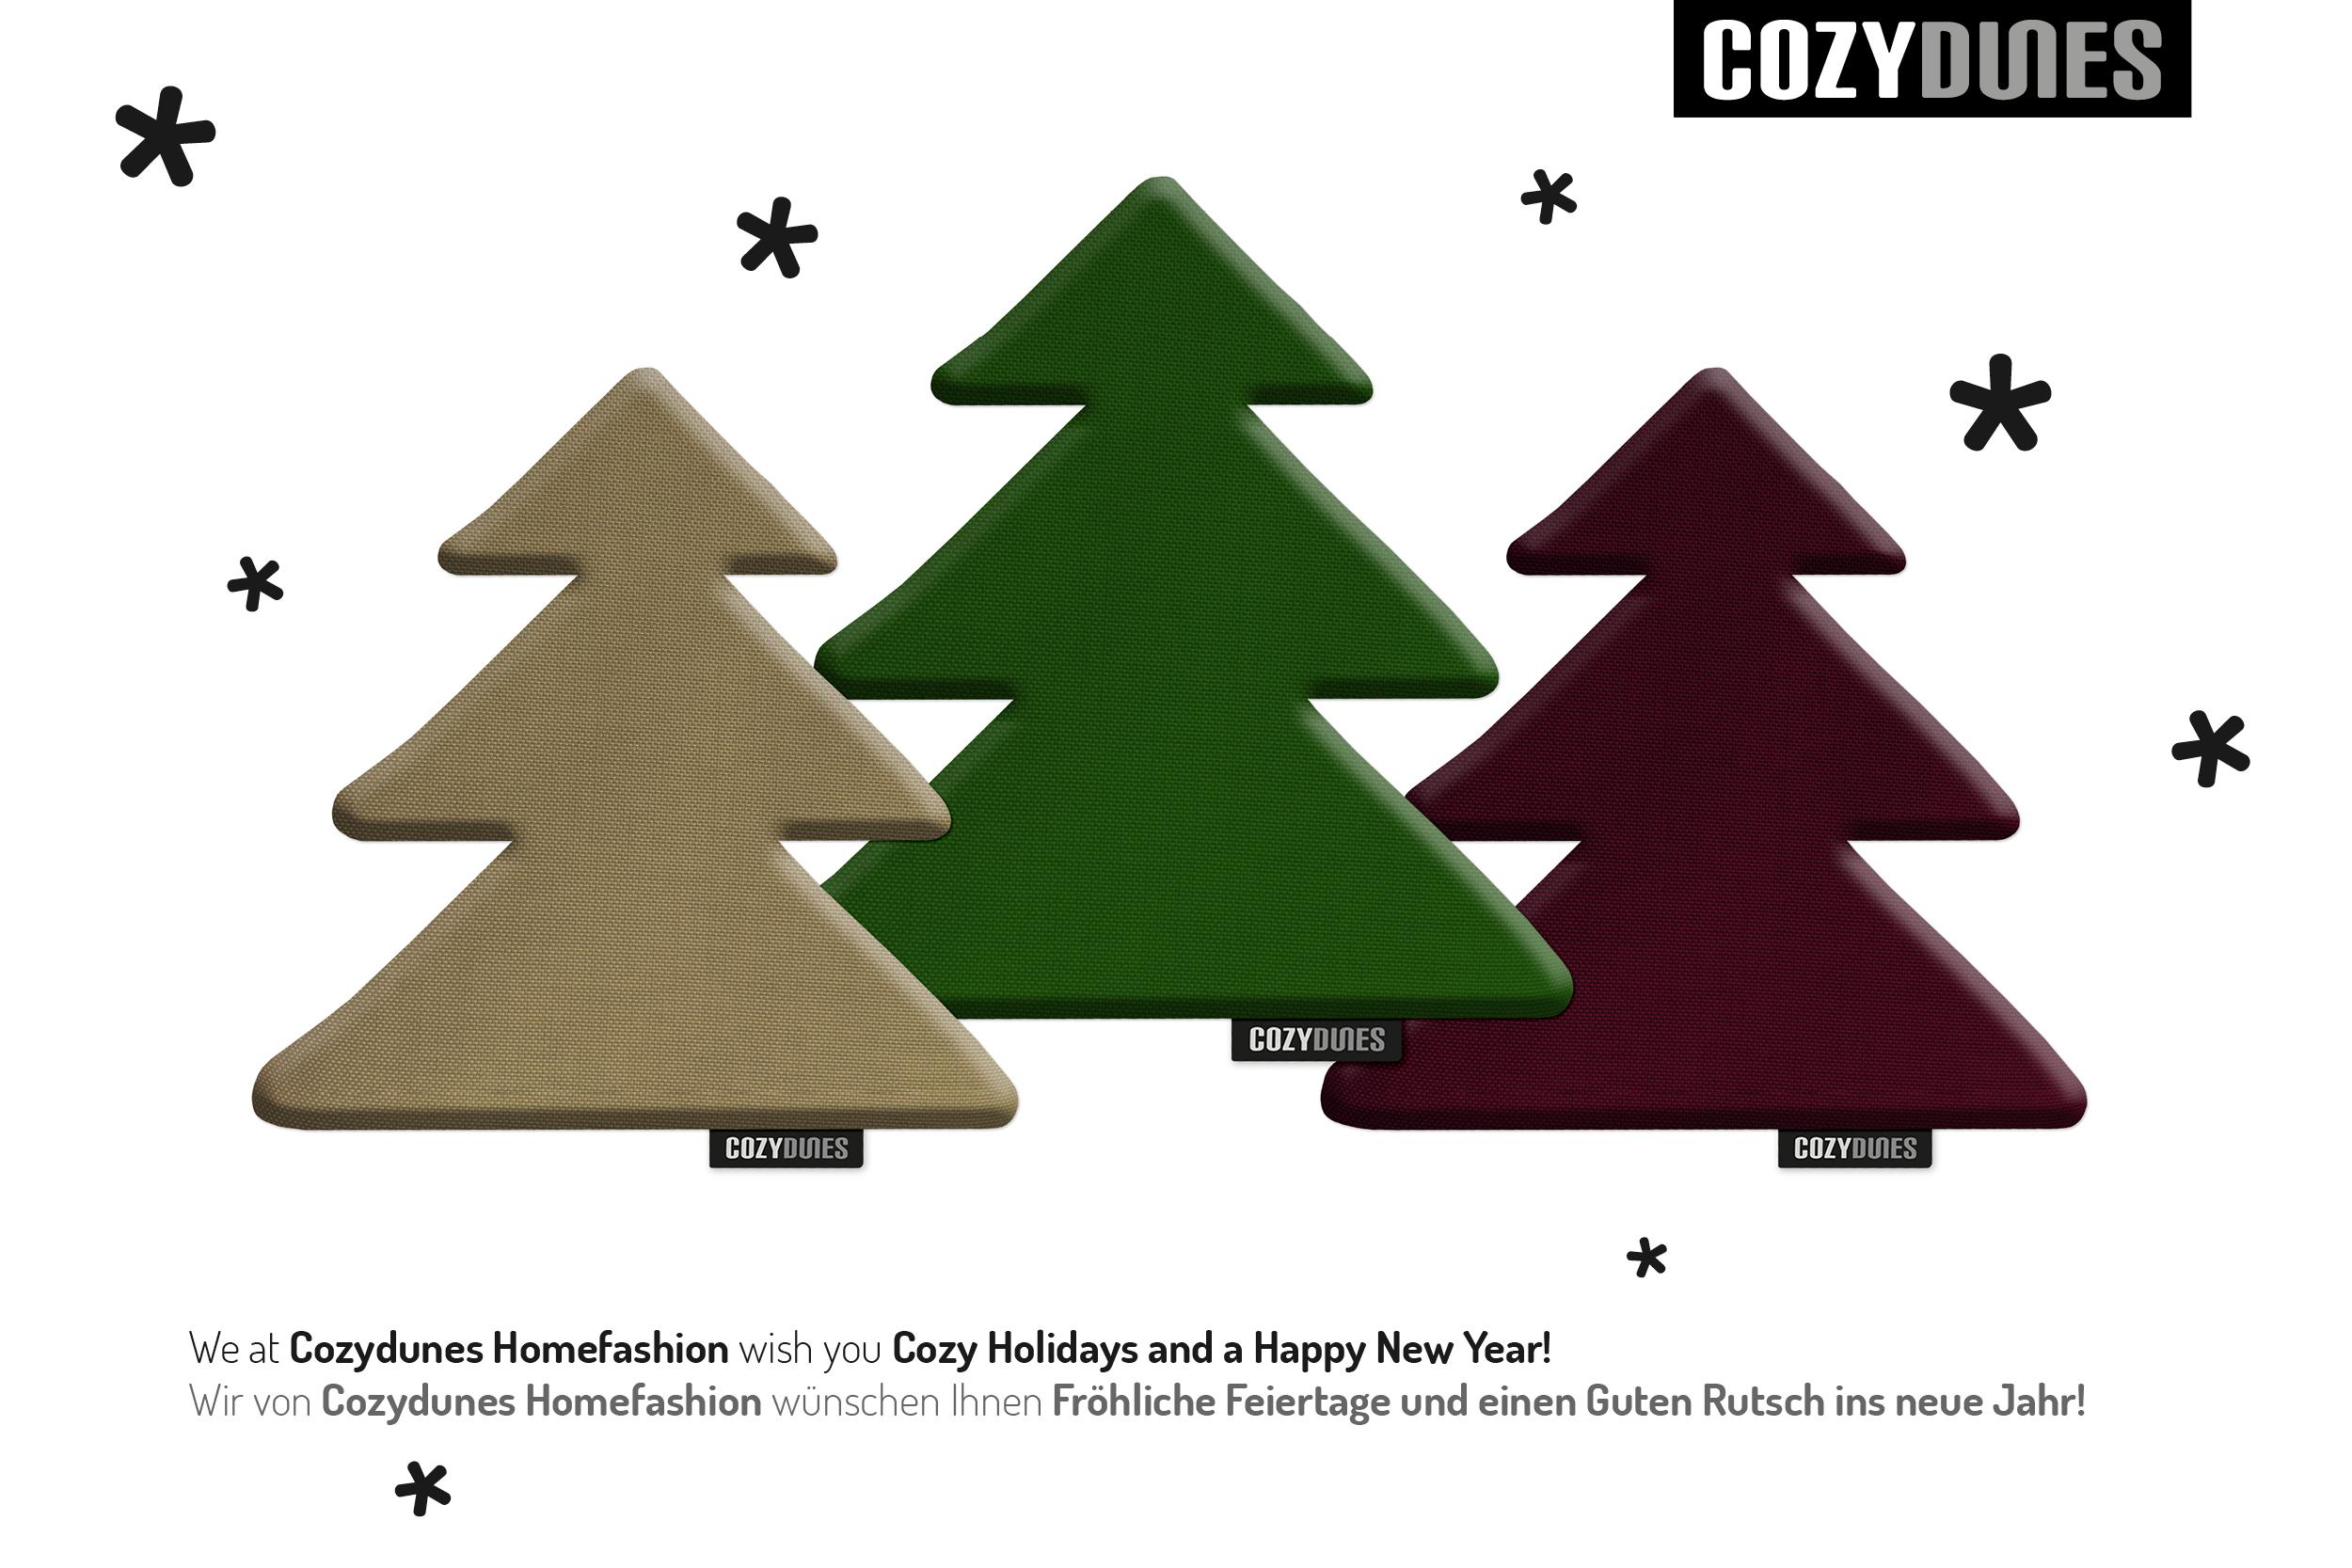 cozydunes_Weihnachtsgruesse_2016_digital_FINAL